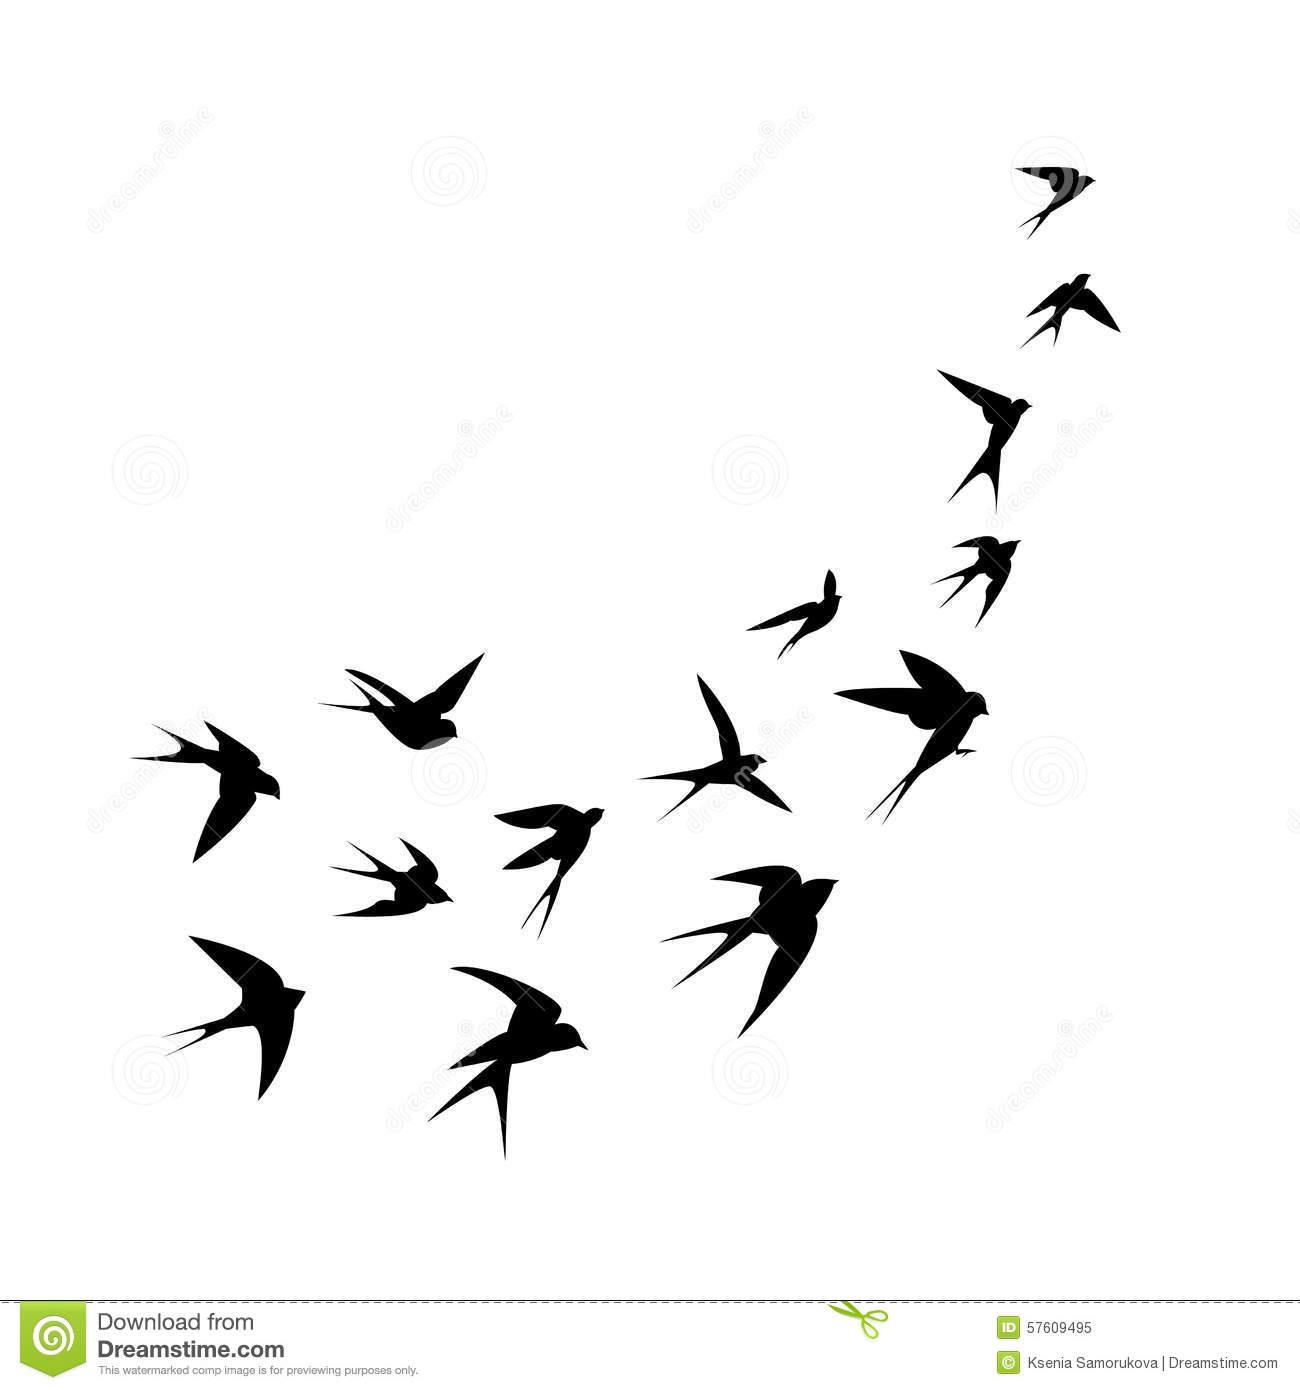 Flock Of Birds Silhouette Royalty Free Stock Photo.